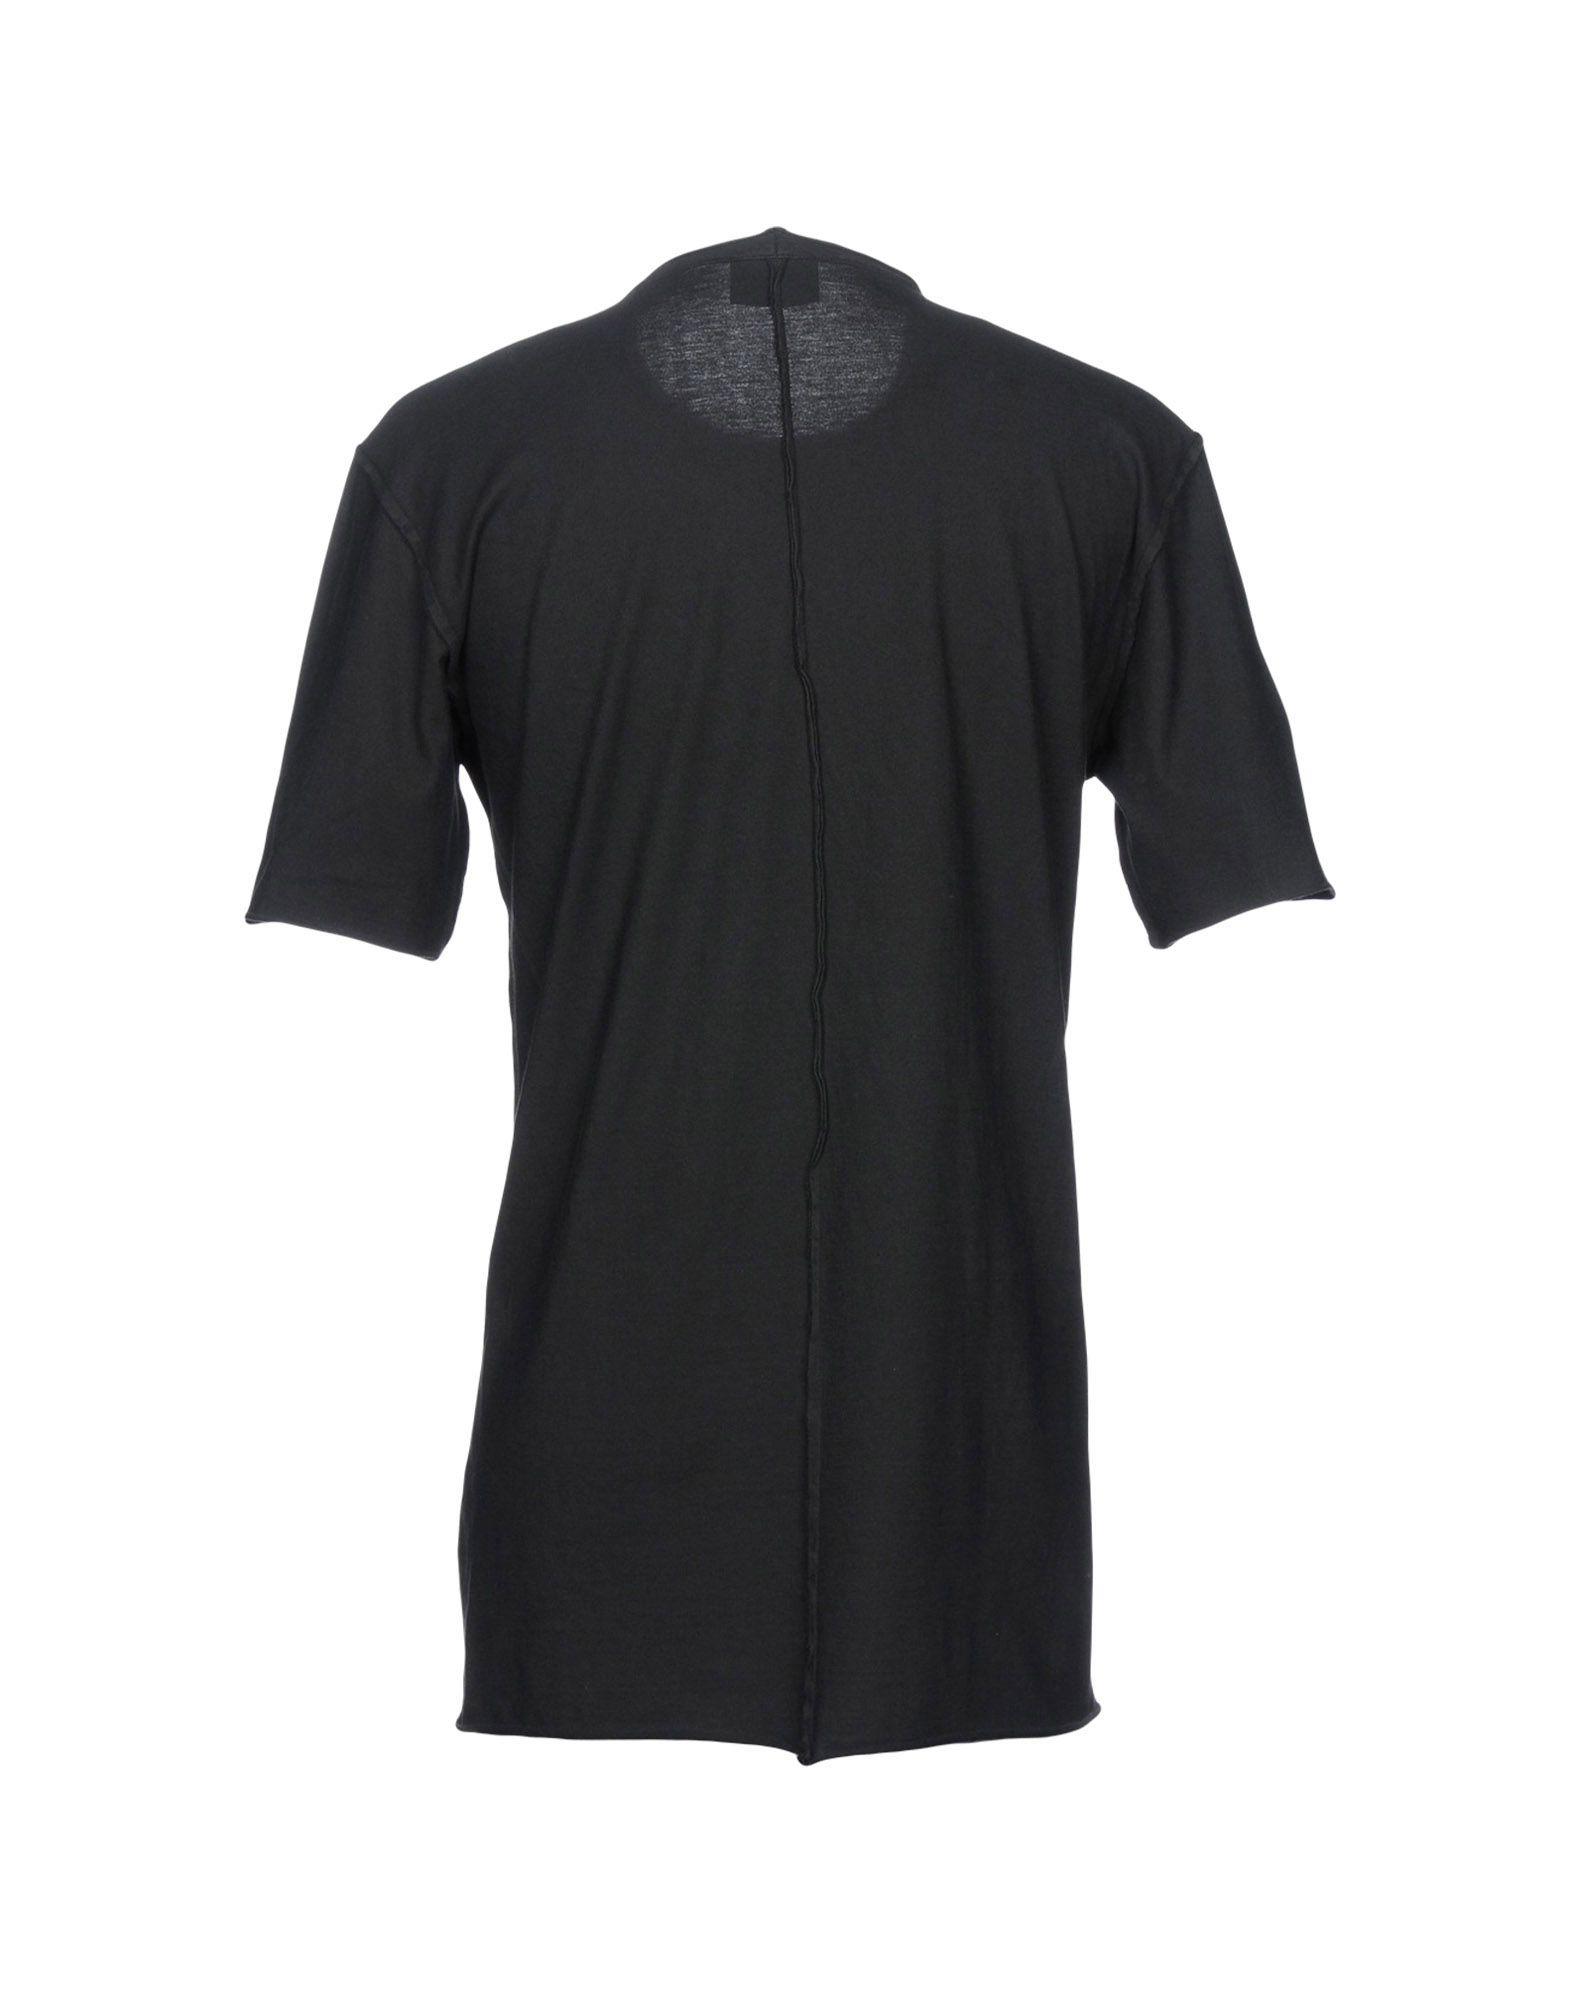 A buon mercato A buon T-Shirt mercato T-Shirt buon Overcome Uomo - 12166029RT 8262c9